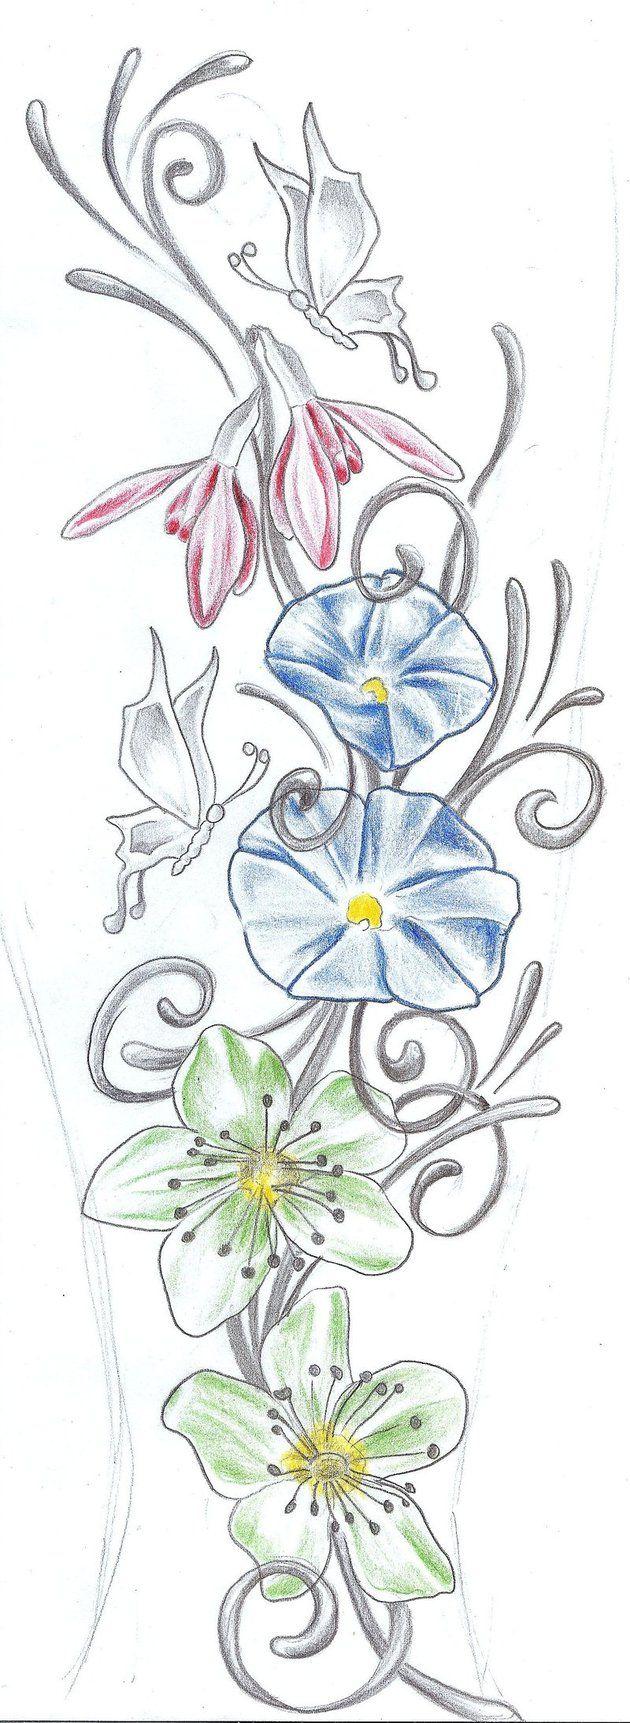 Enredaderas De Flores Para Pintar Imagui Dibujos Para Iluminar